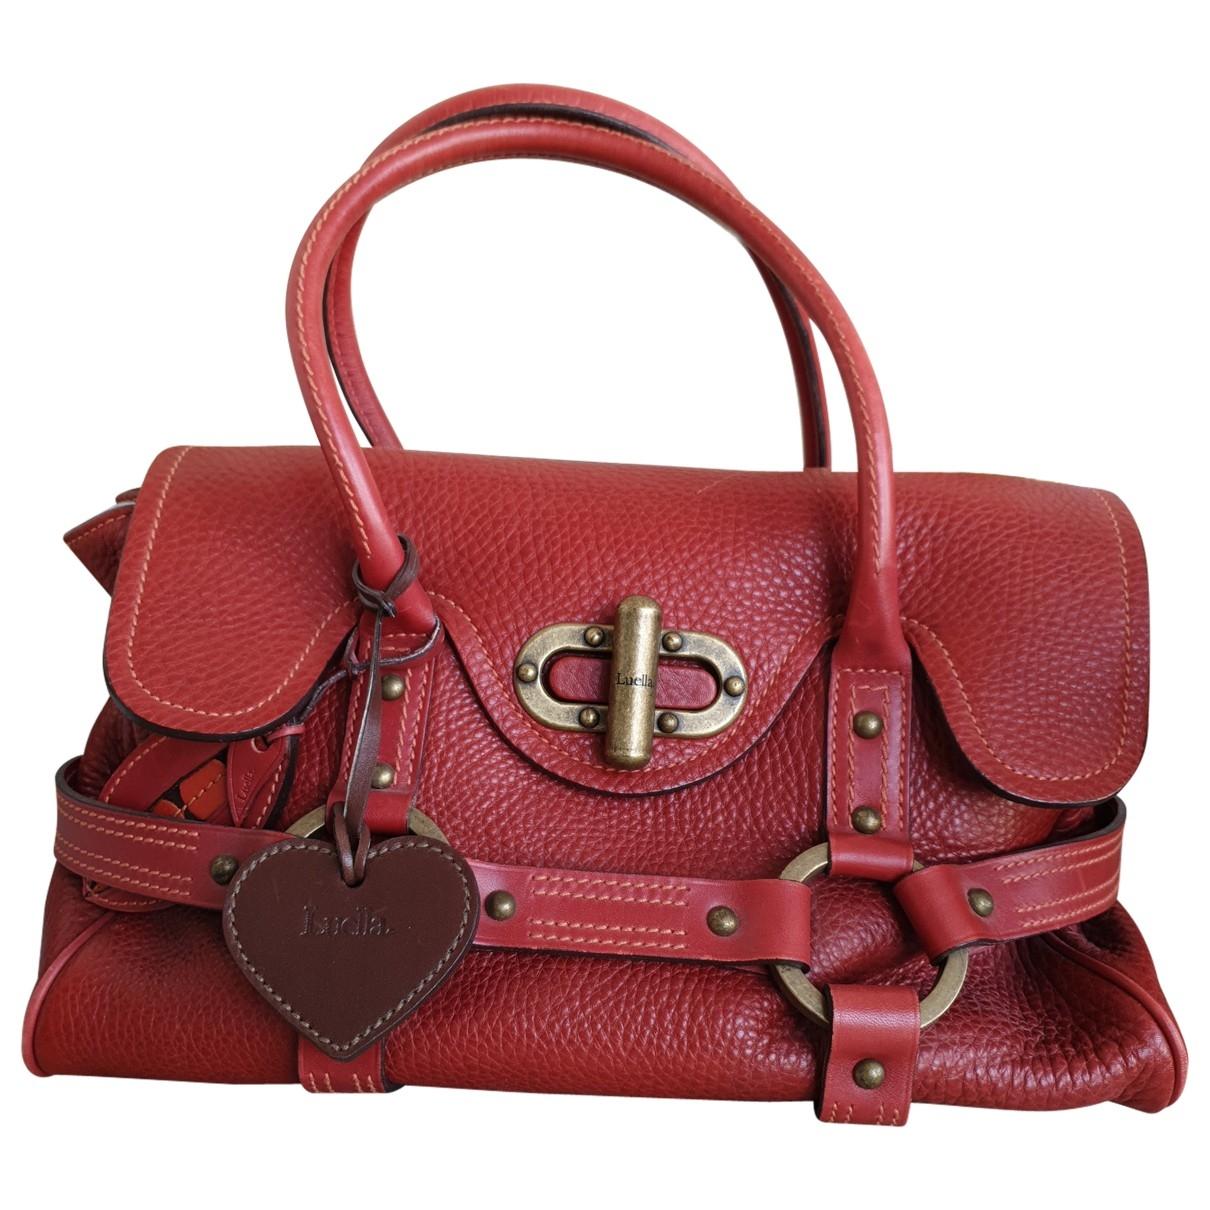 Luella \N Red Leather handbag for Women \N